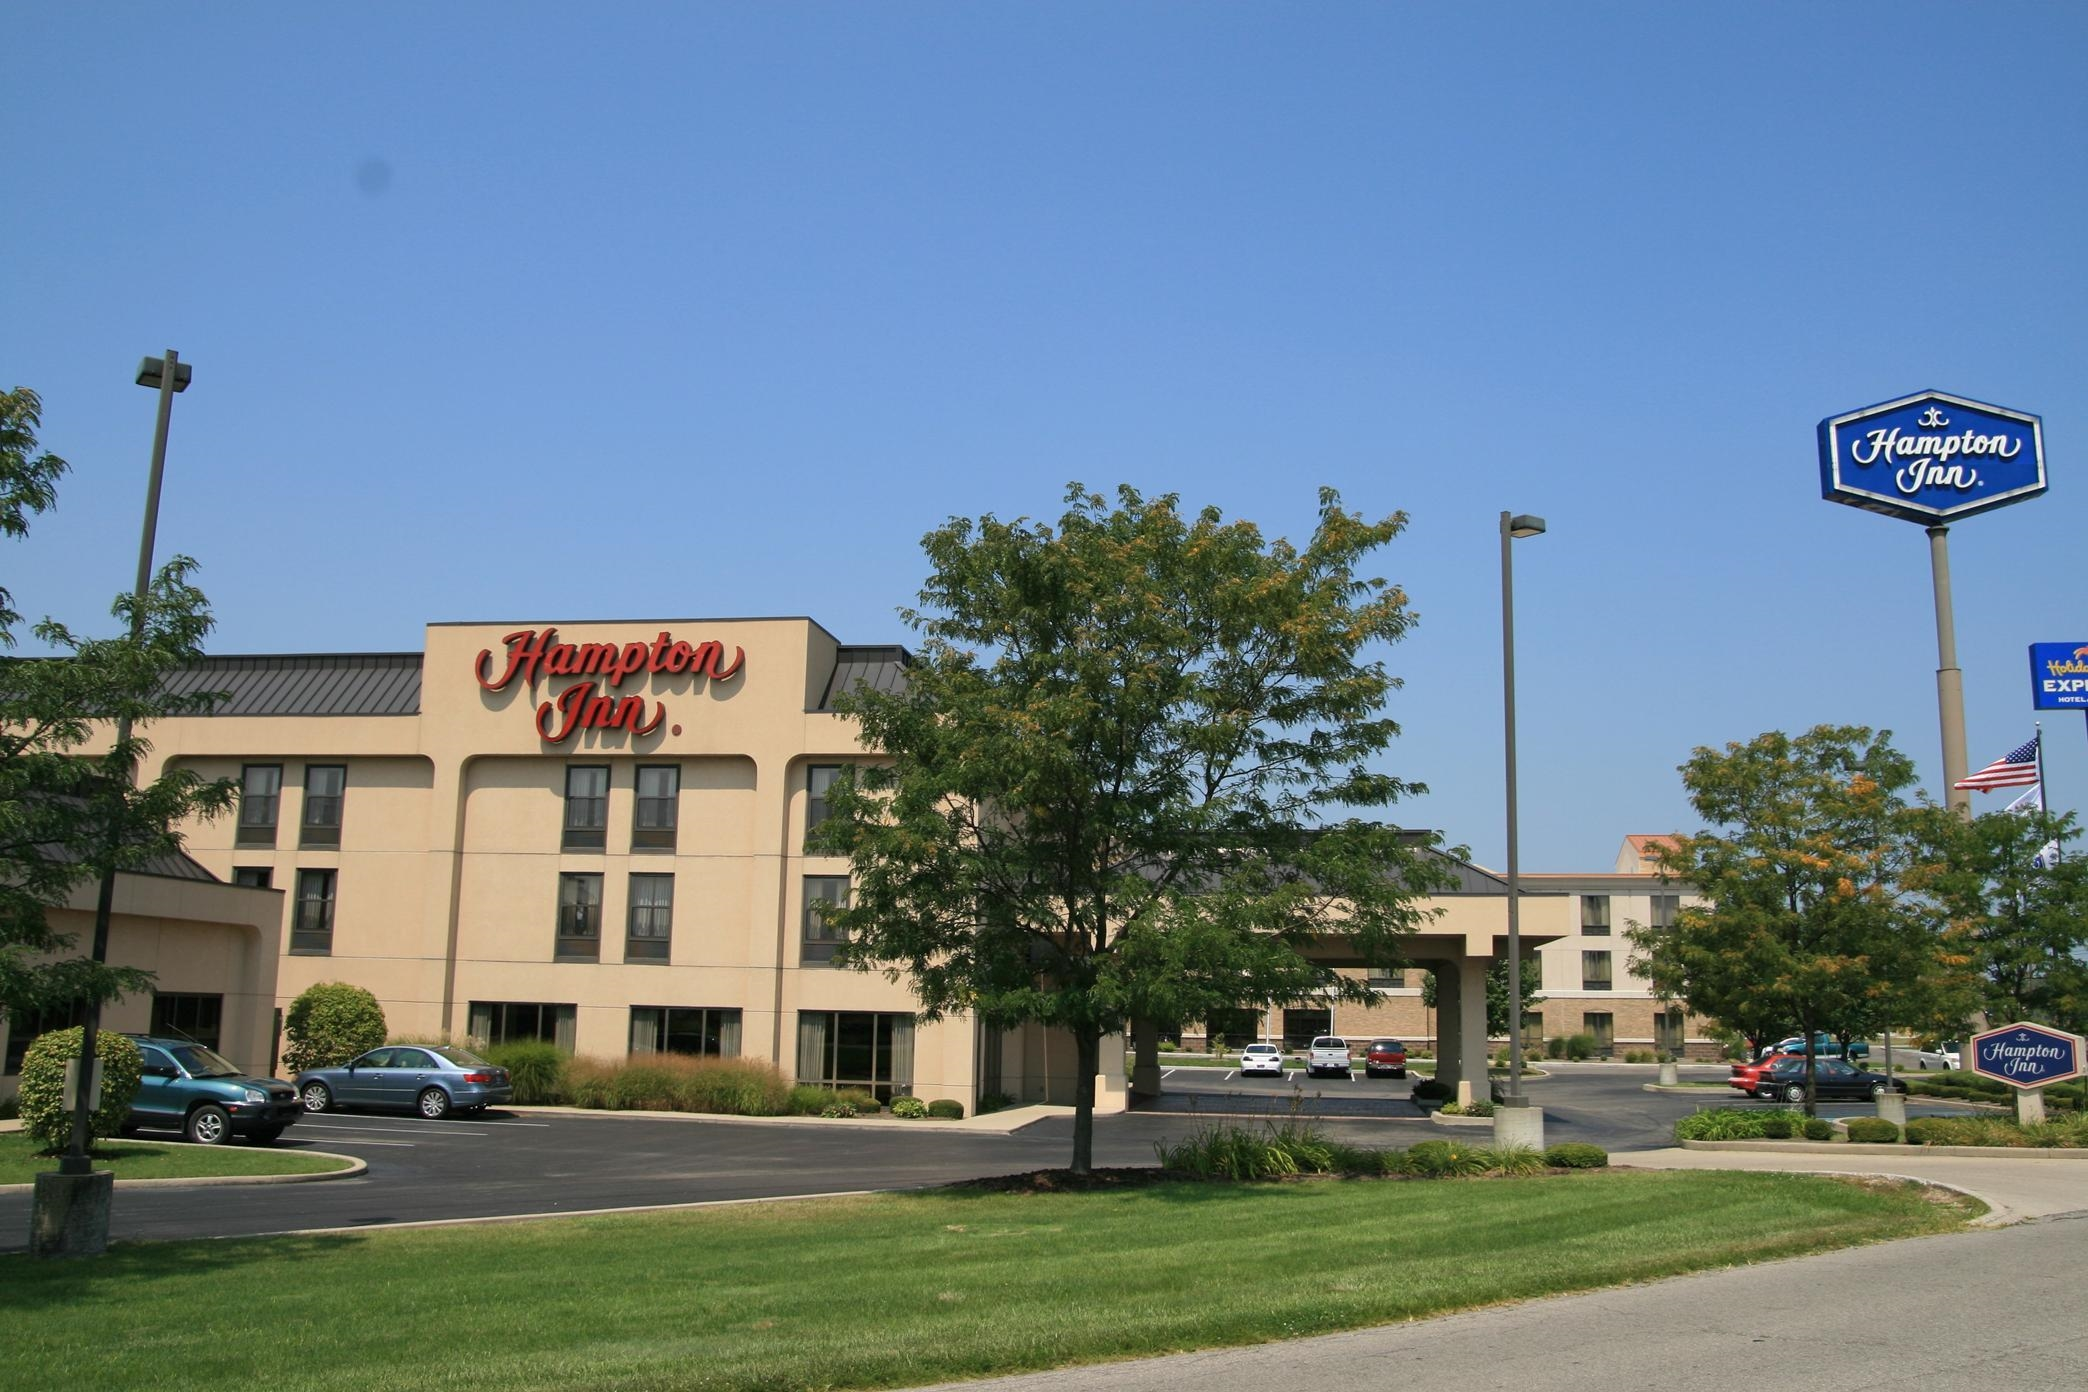 Bob Poynter Seymour Indiana >> Business Directory for Seymour, IN - ChamberofCommerce.com